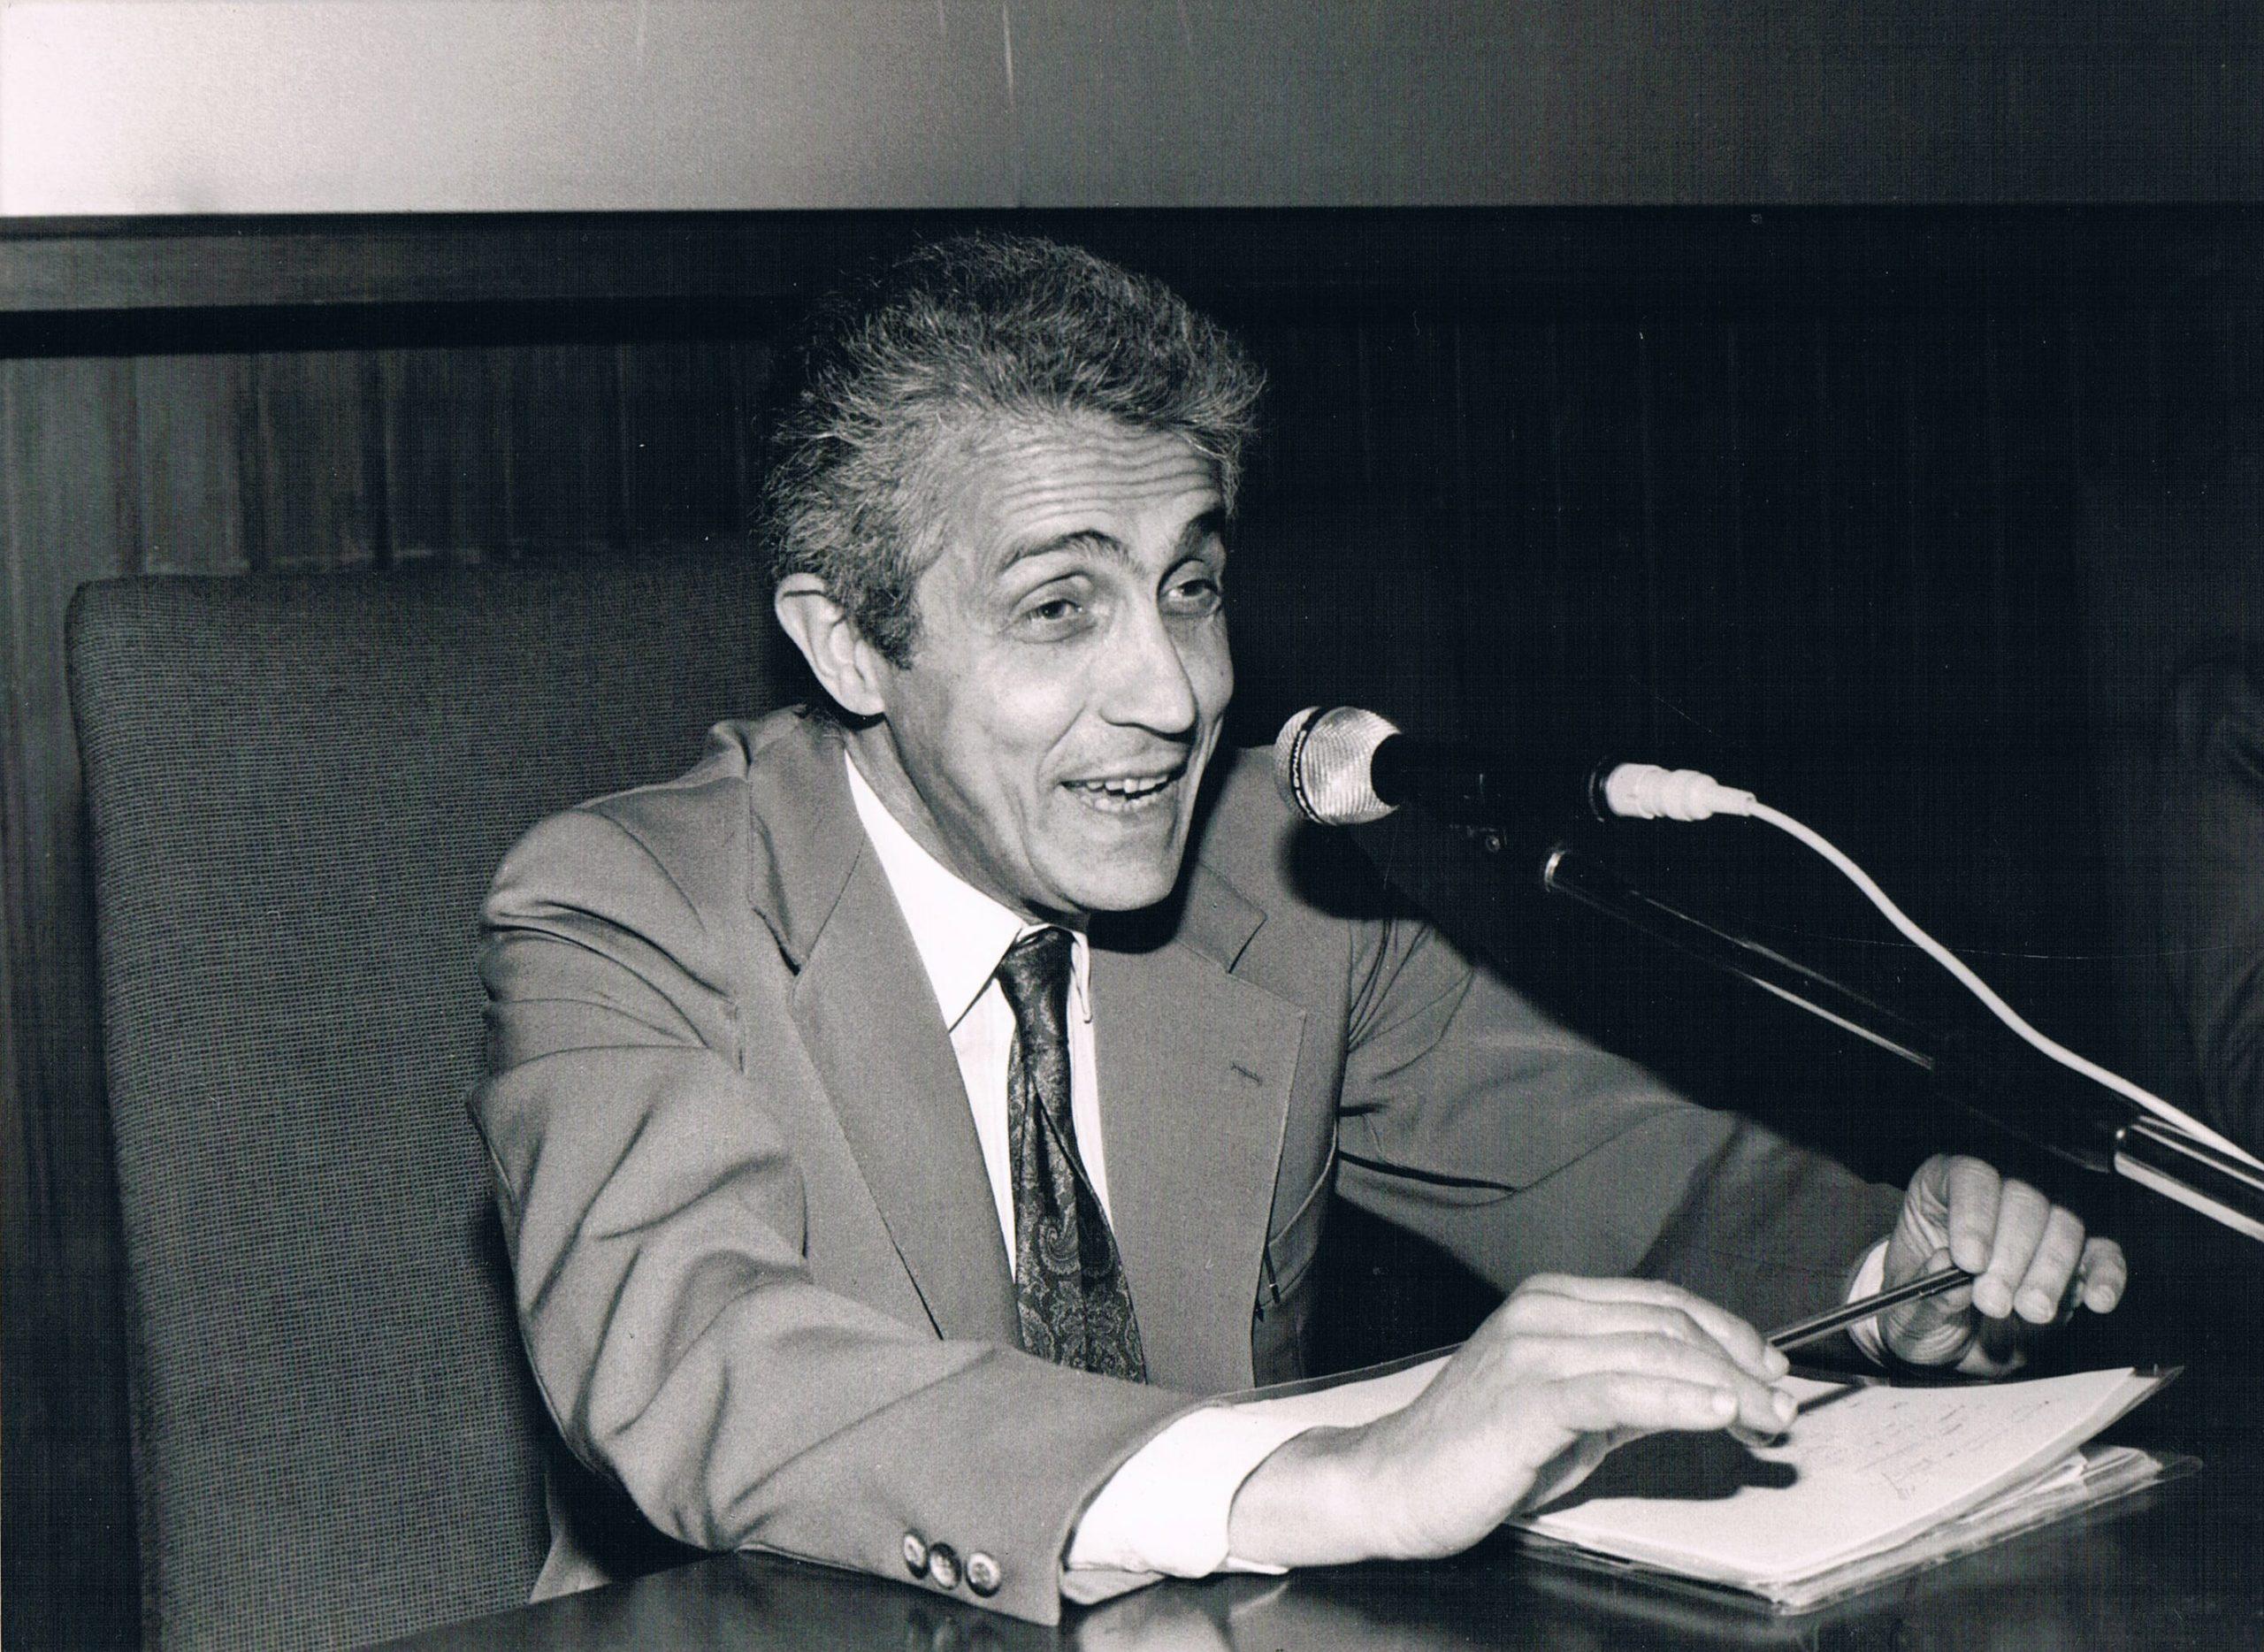 Gino Giugni